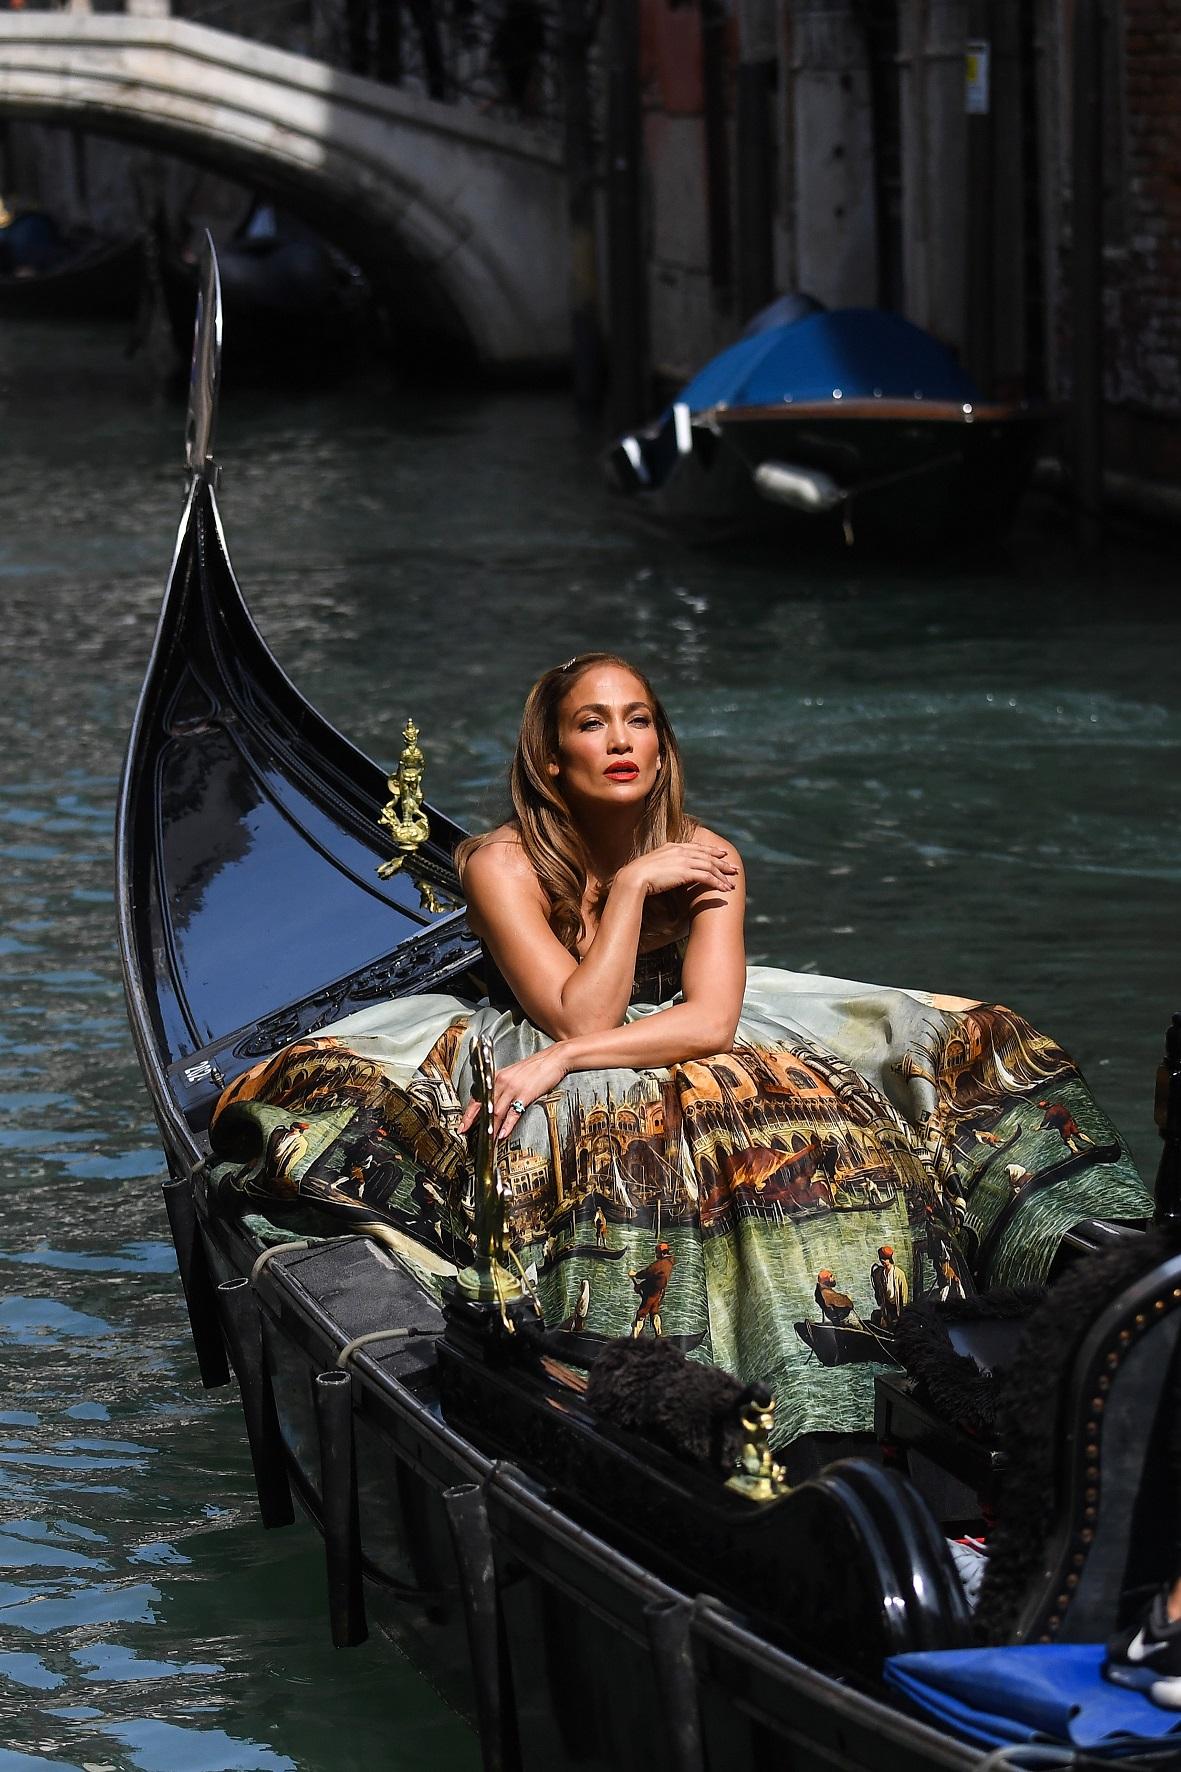 Jennifer Lopez Climbs in Gondola During Photoshoot in Venice